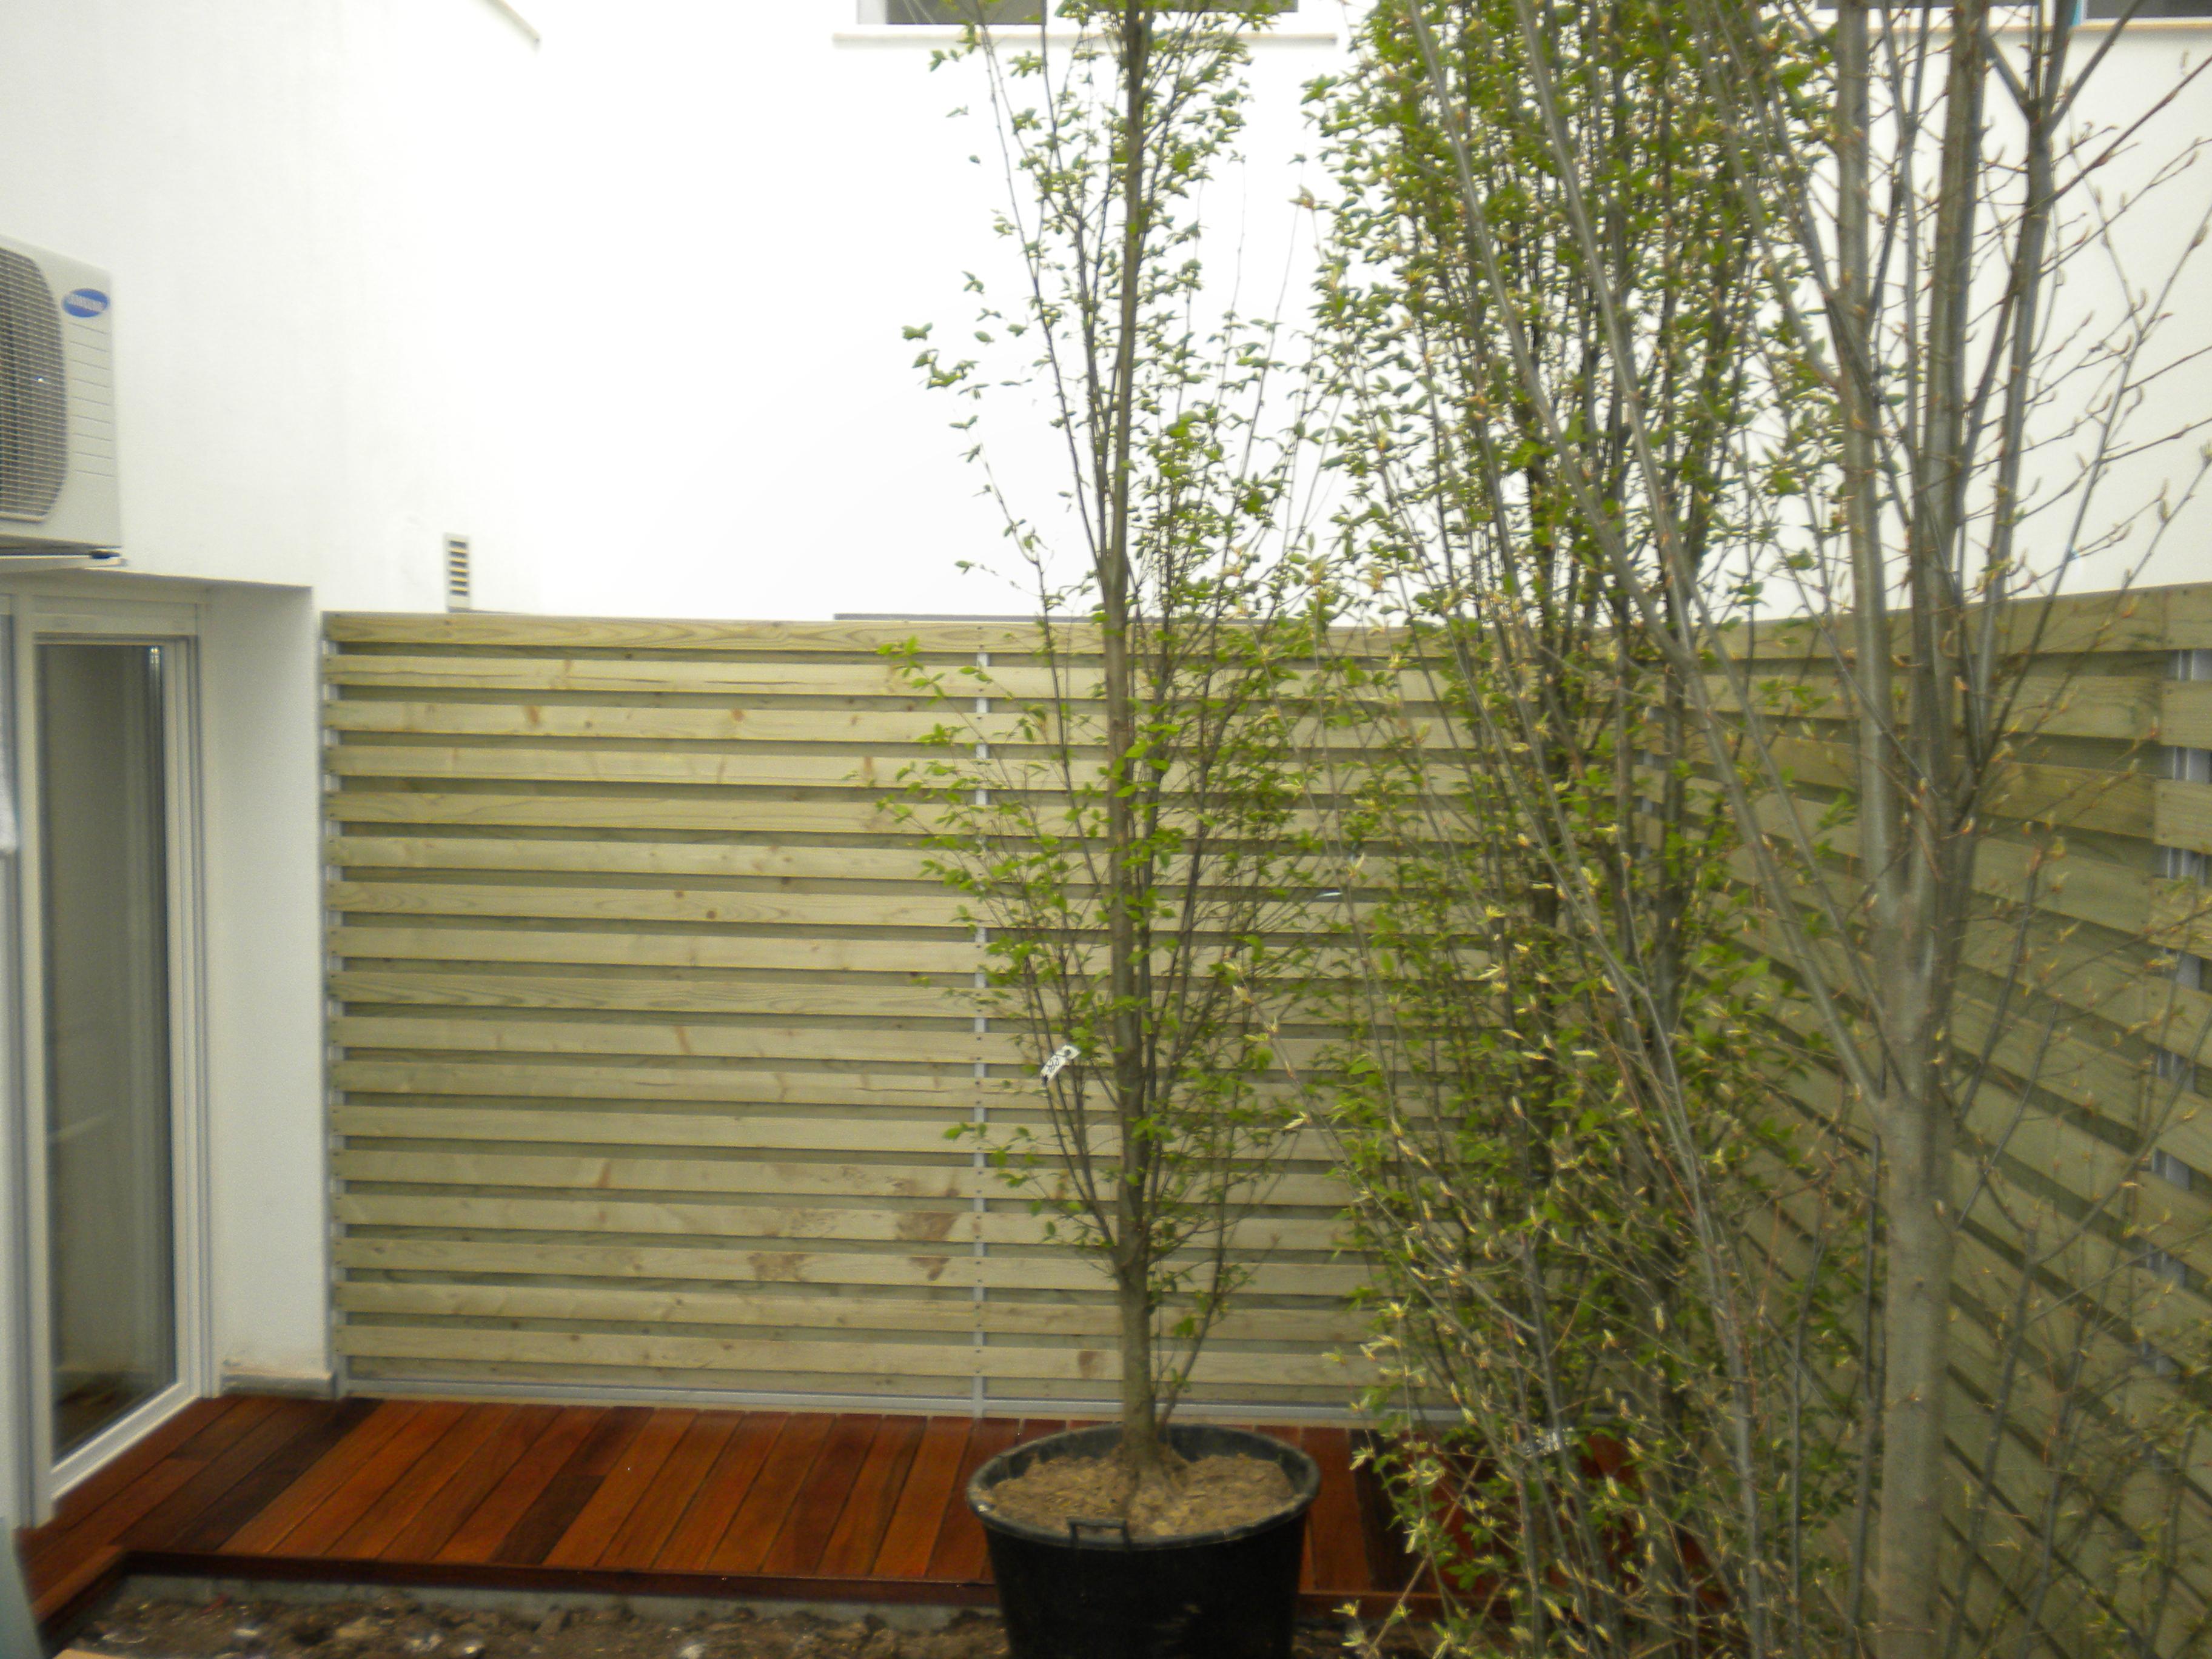 Deck-uri lemn - Sucupira Red SELVA FLOORS - Poza 43